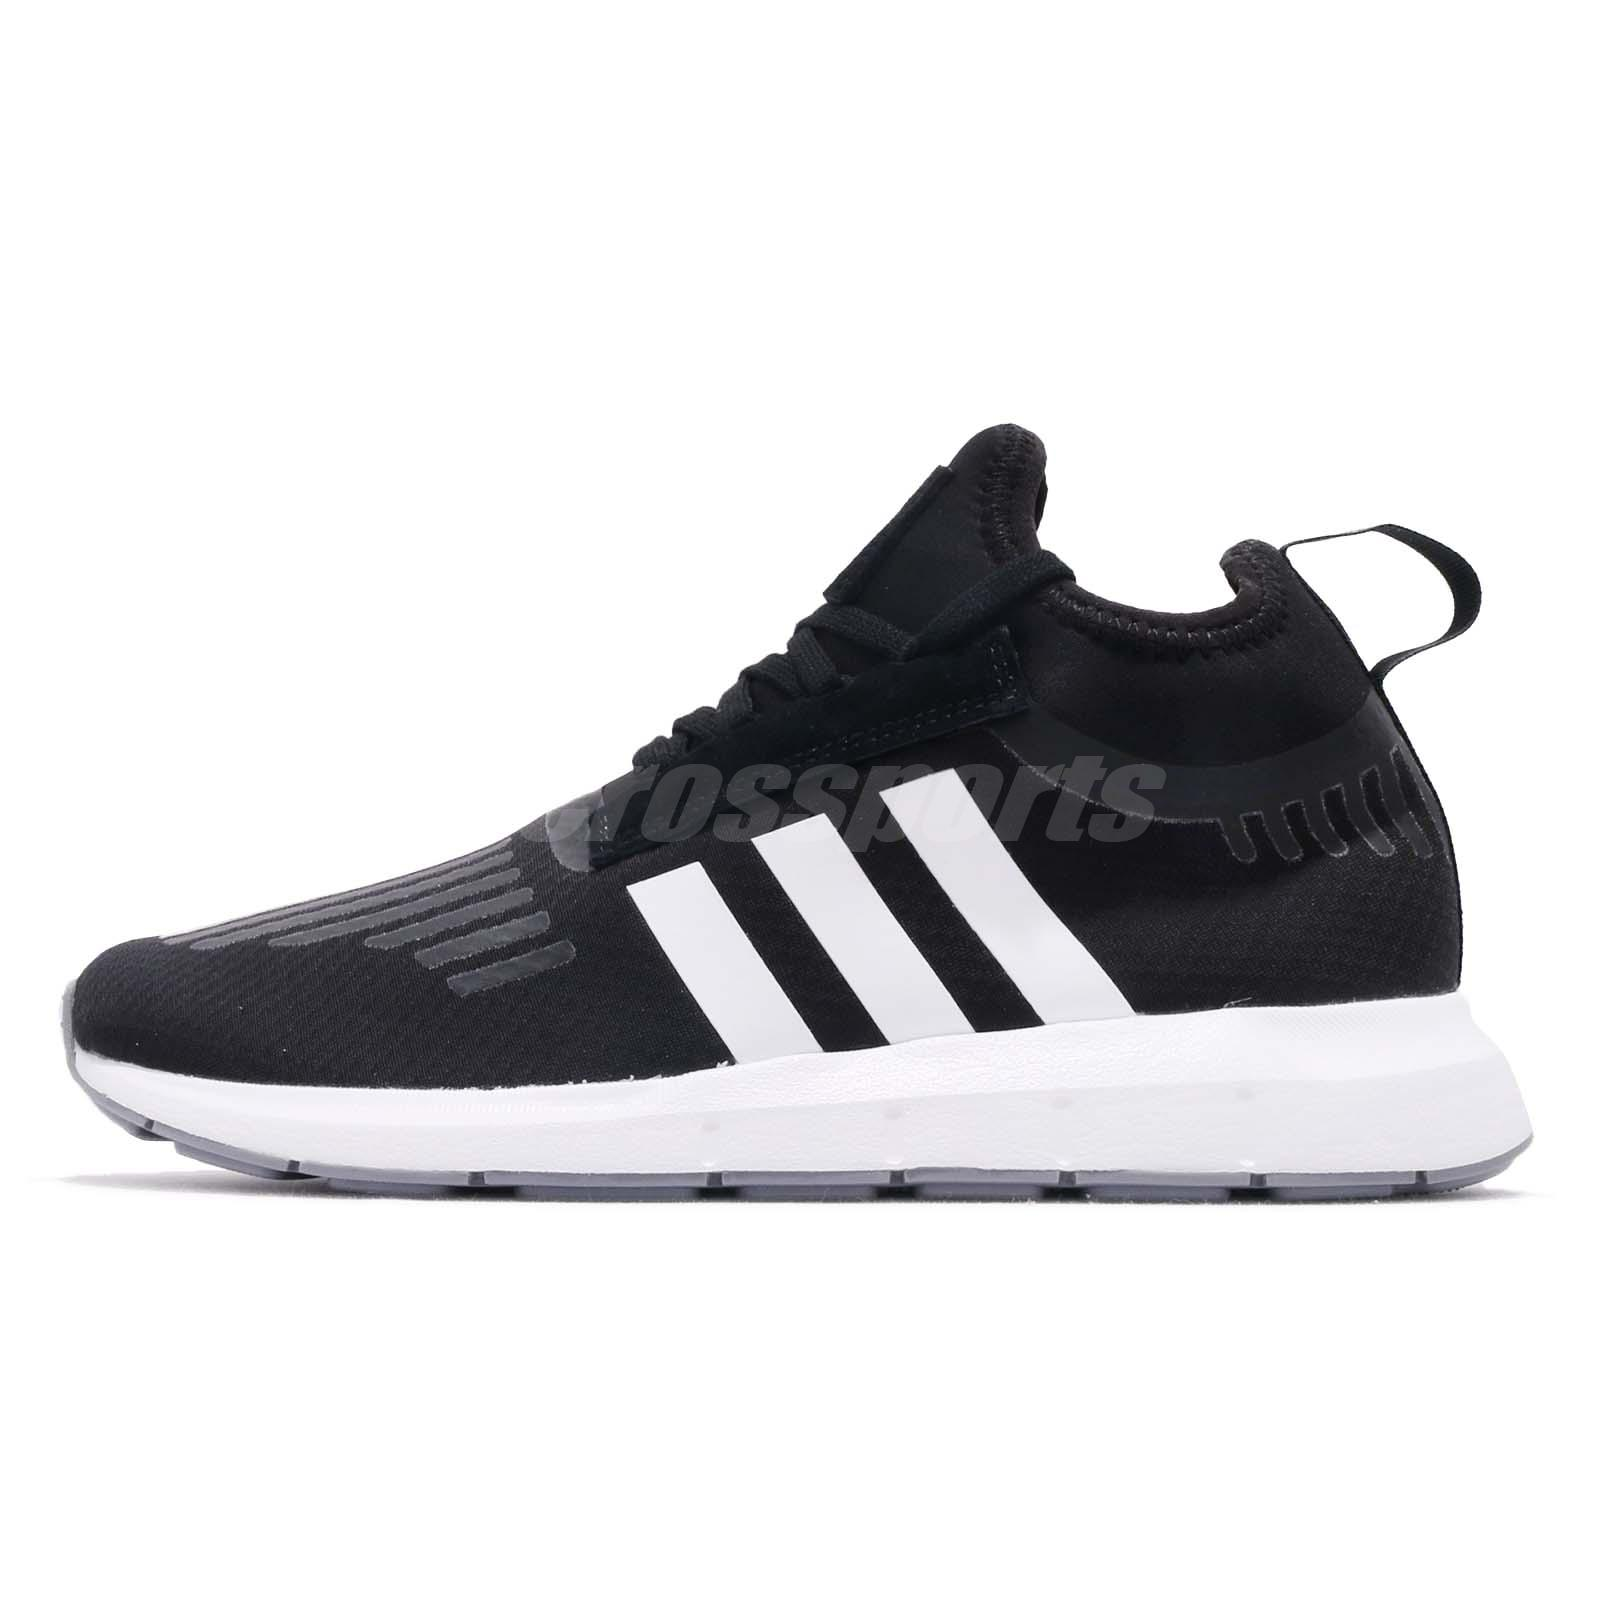 cc73d8f2bddf6 adidas Originals Swift Run Barrier Black White Grey Men Running Shoes B37701